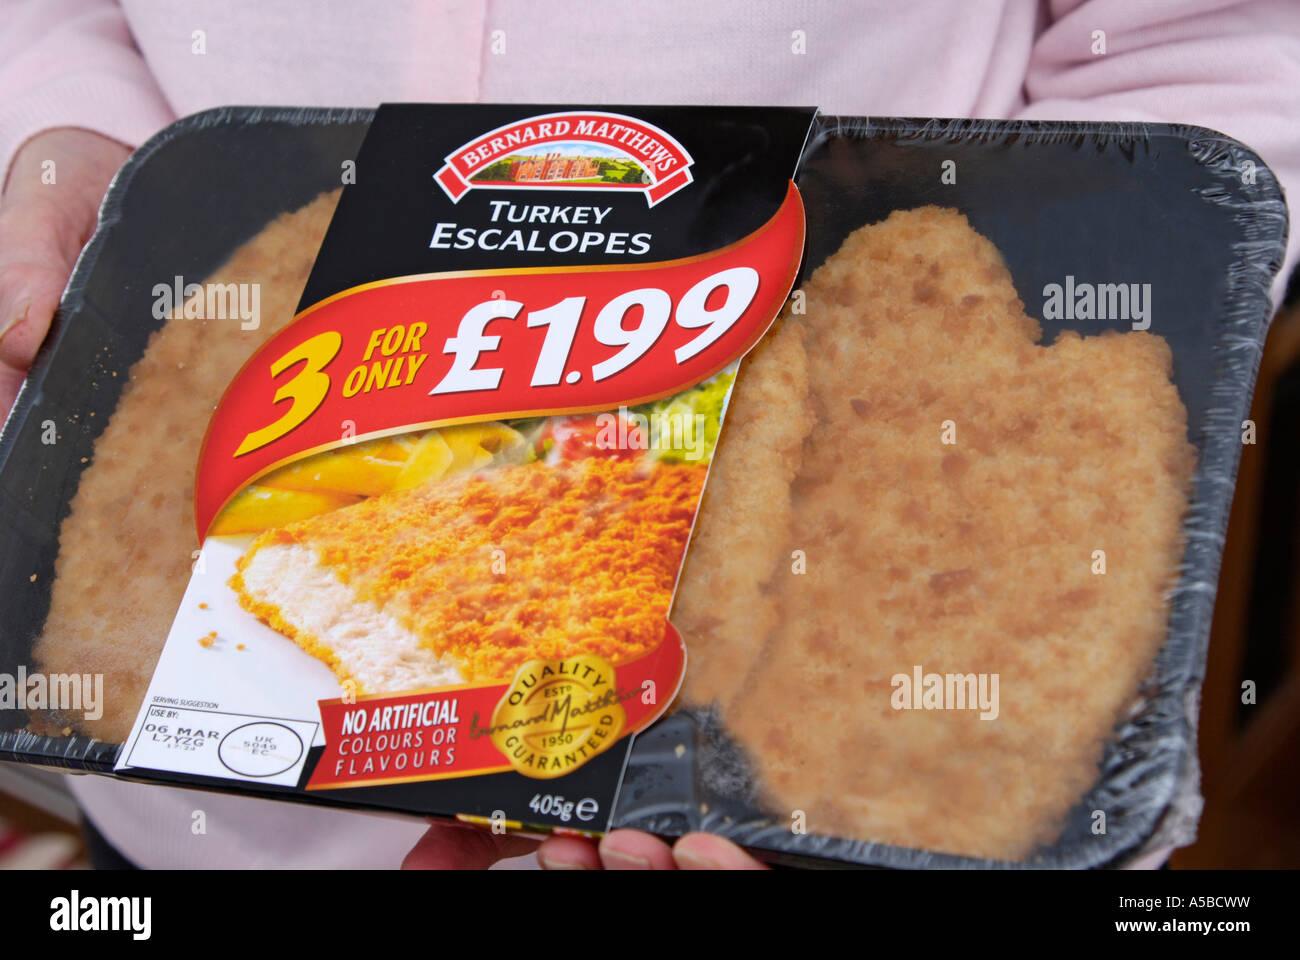 Bernard Matthews turkey escalopes value pack Stock Photo